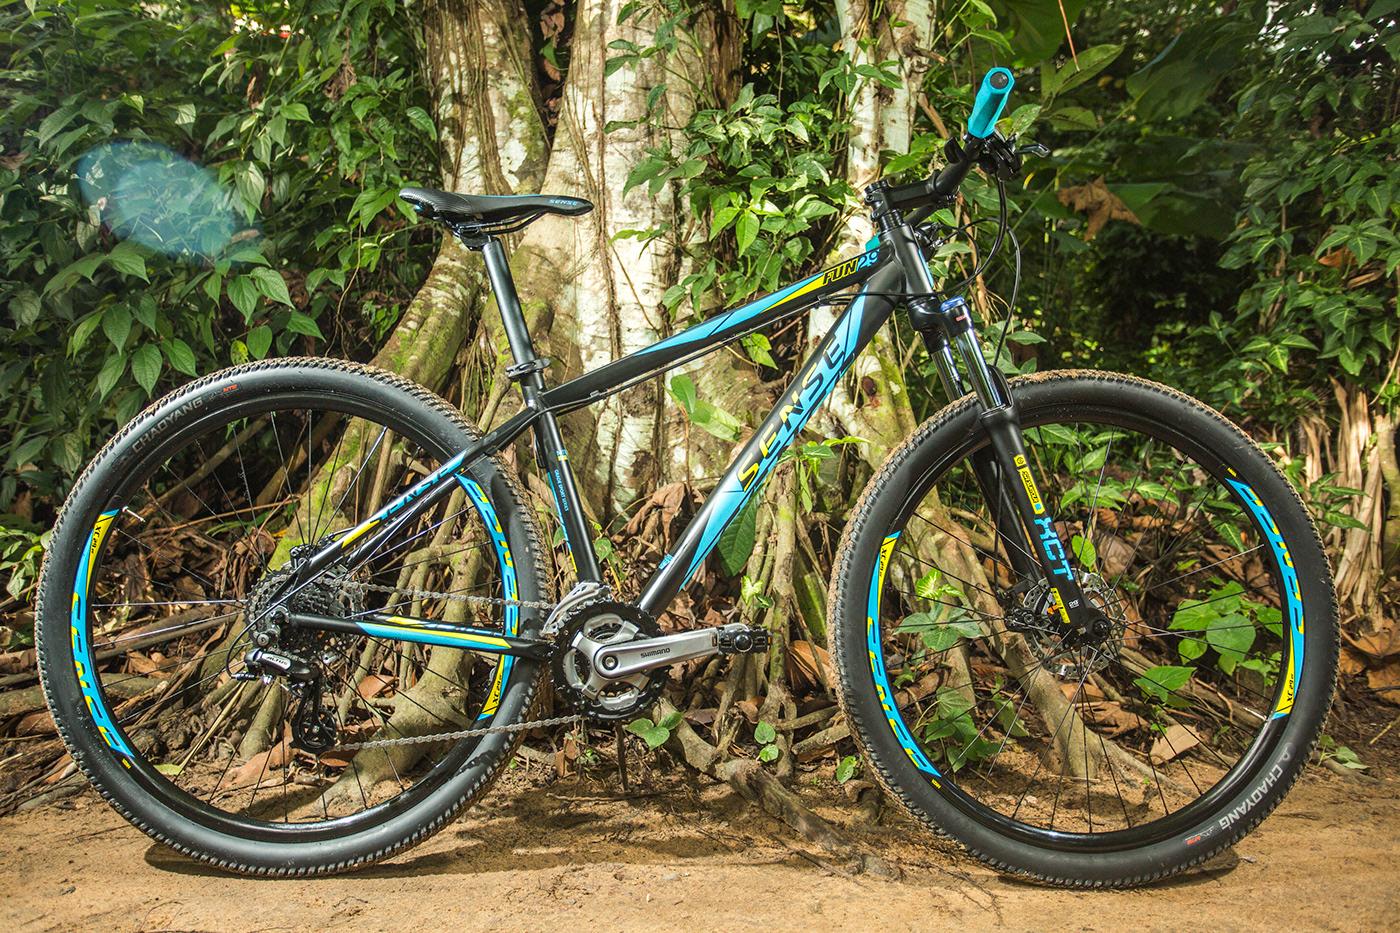 cycle Bicycle bicicleta brasileira Gabriel Delfino Delfino Design Bicycle Design Bike bike design visual identity design de bicicletas